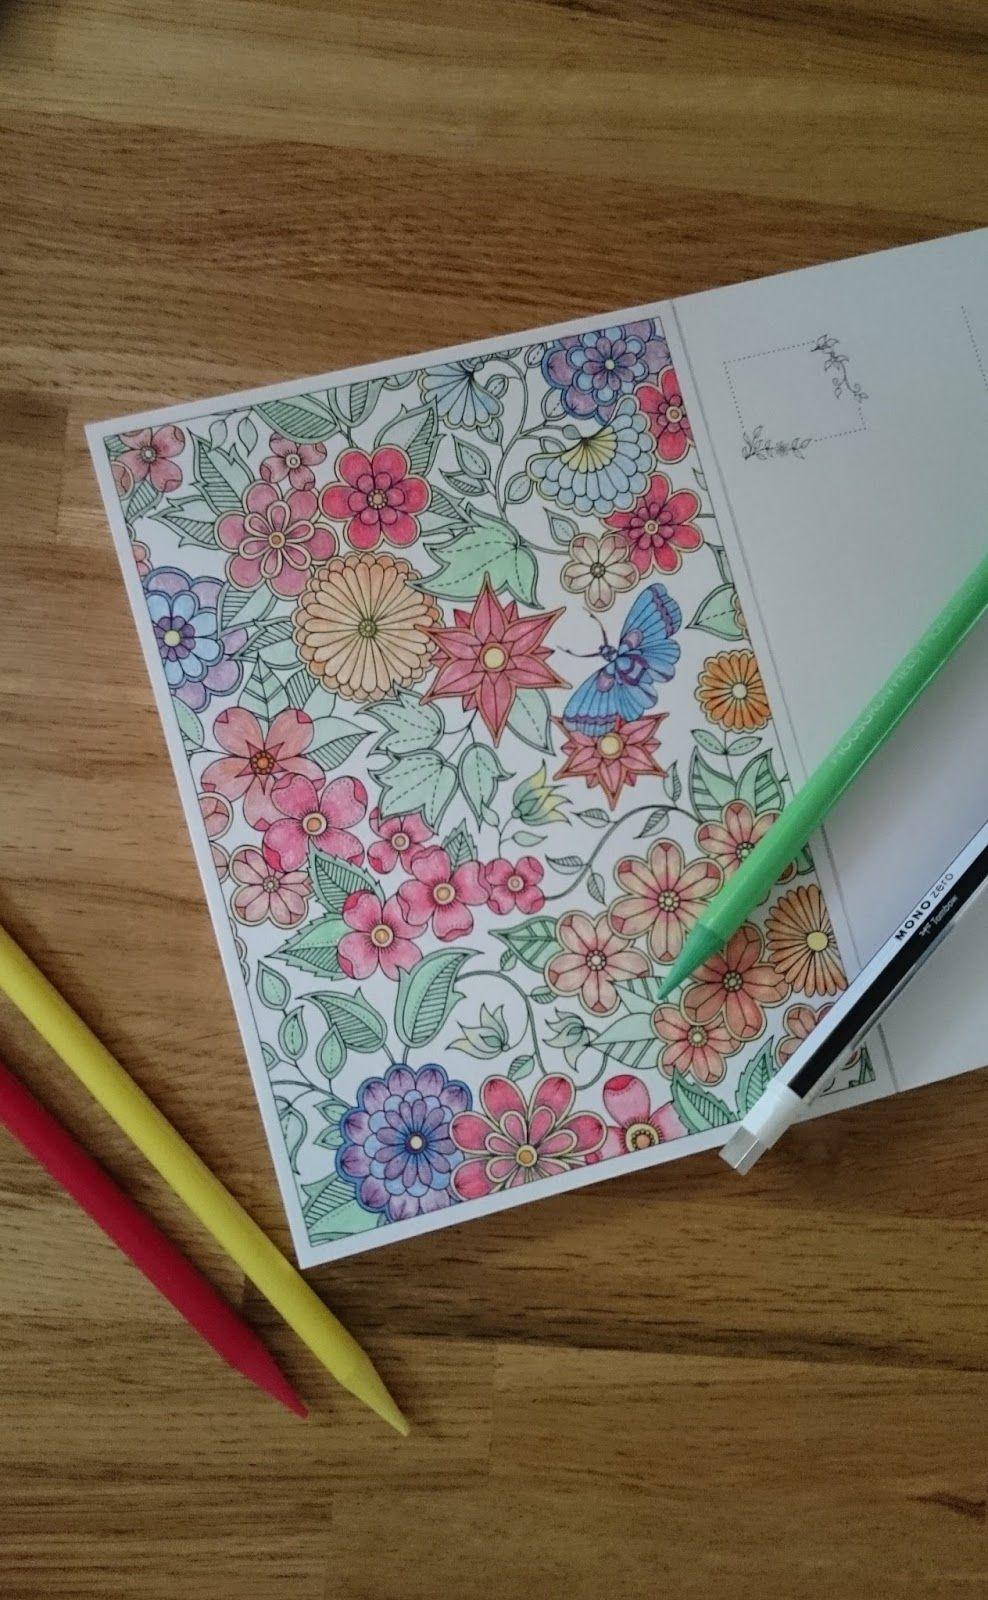 Secret Garden Postcard 1 Colouring Challenge Postcard Design Secret Garden Colouring Postcard